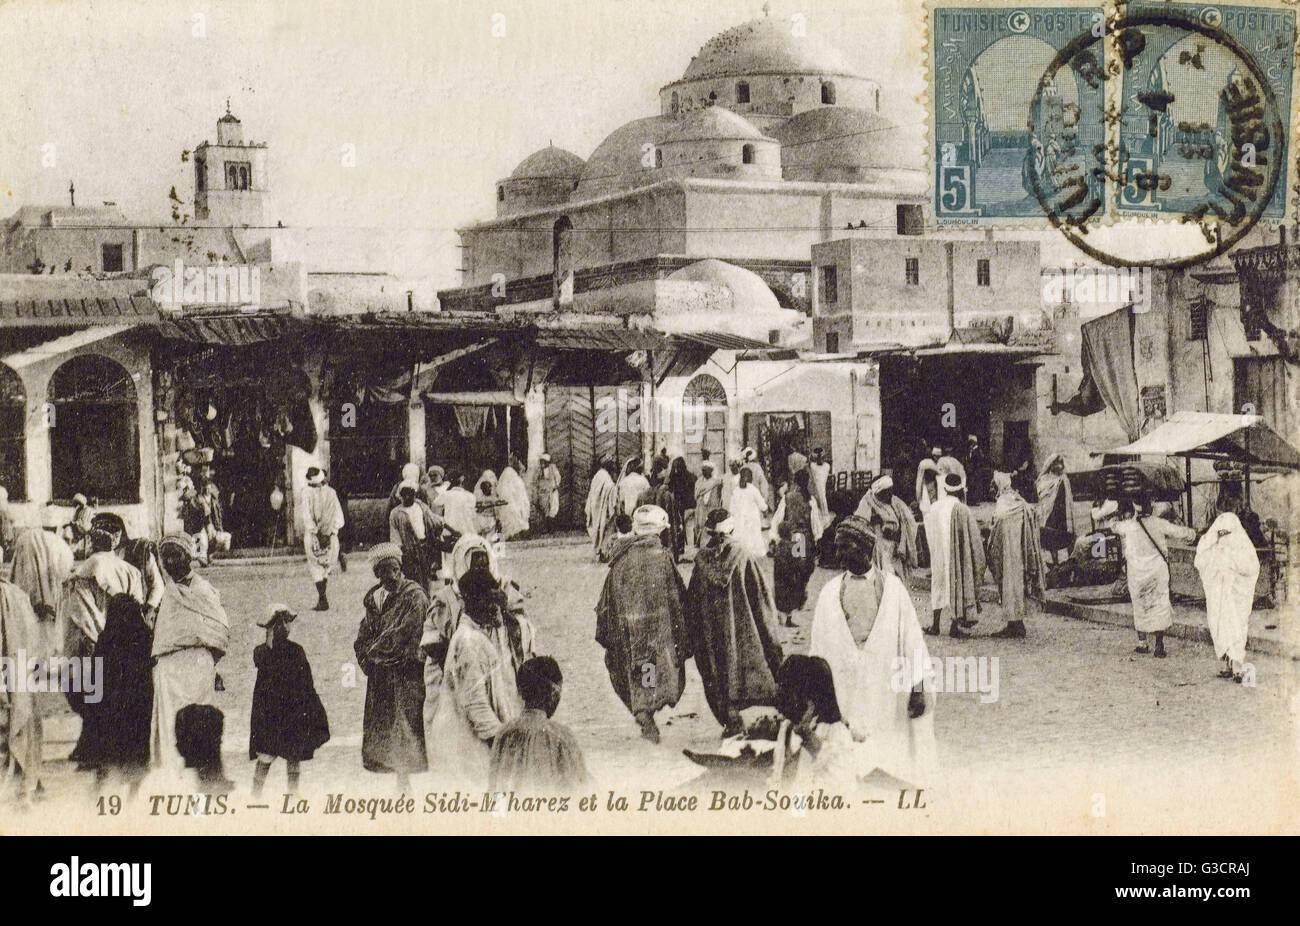 Tunisia - Tunis - Sidi Mehrez Mosque (1675-92), from Place Bab Souika     Date: circa 1910s - Stock Image